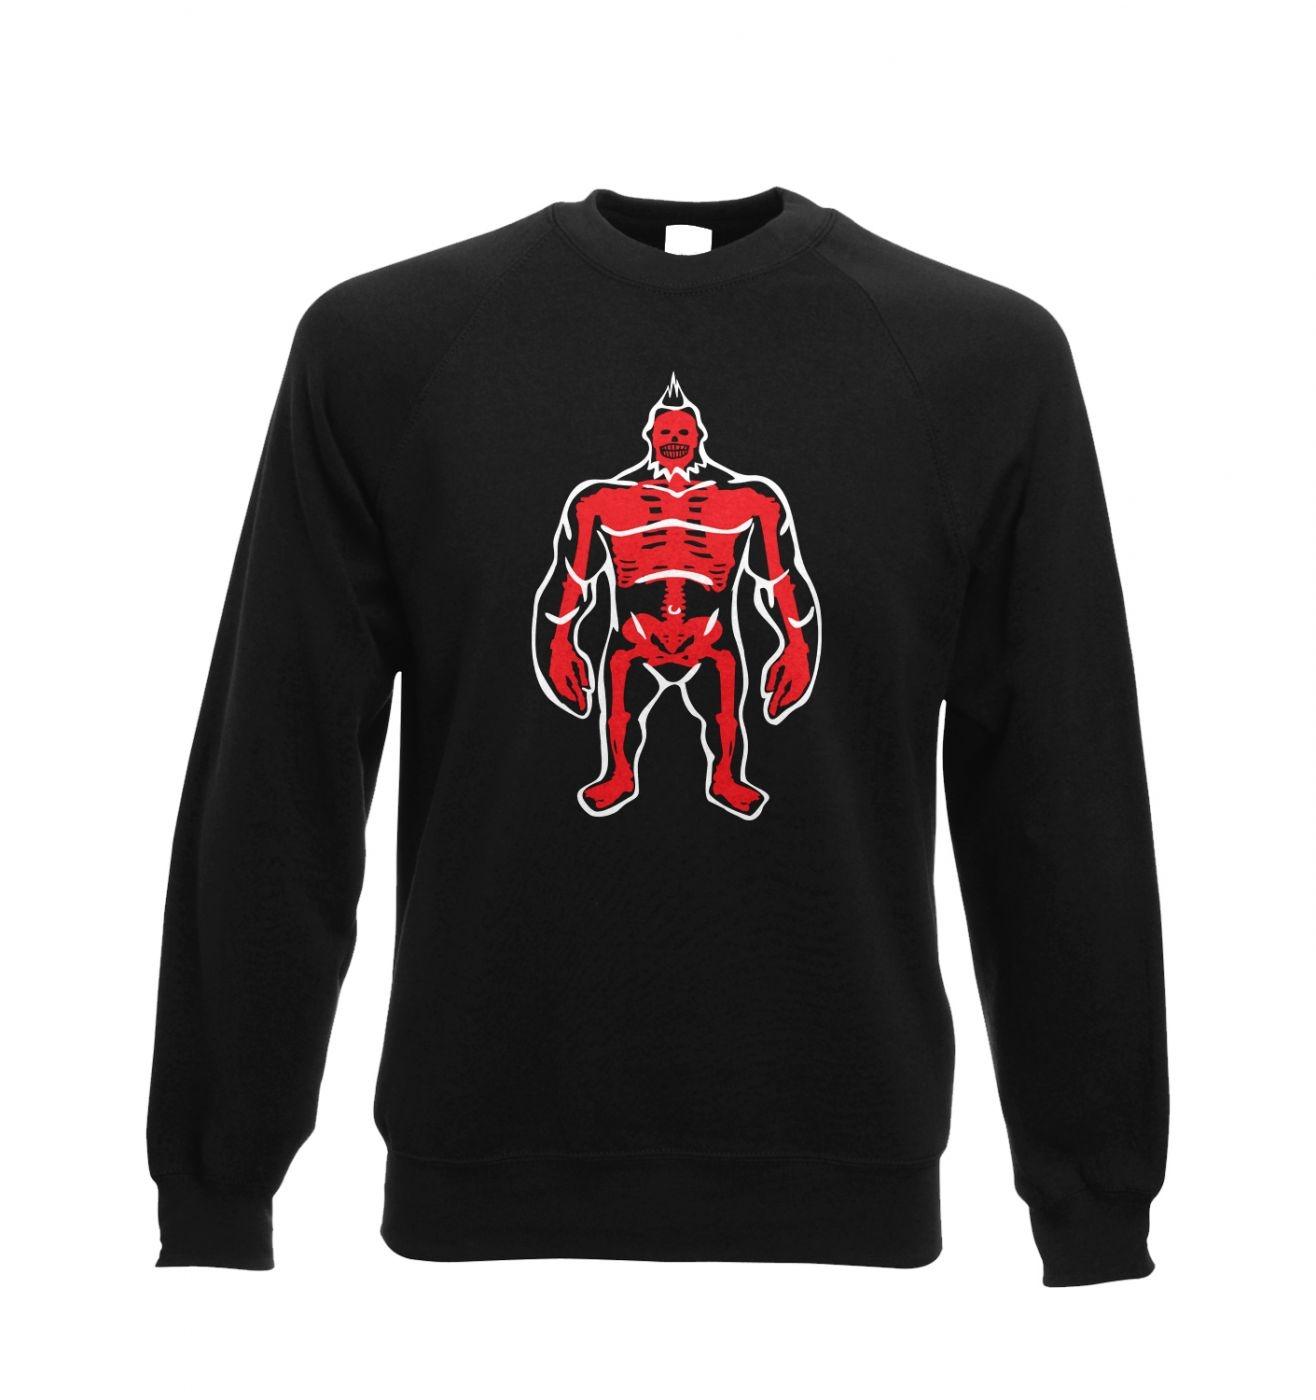 Anatomy Of Gunzerker crewneck sweatshirt